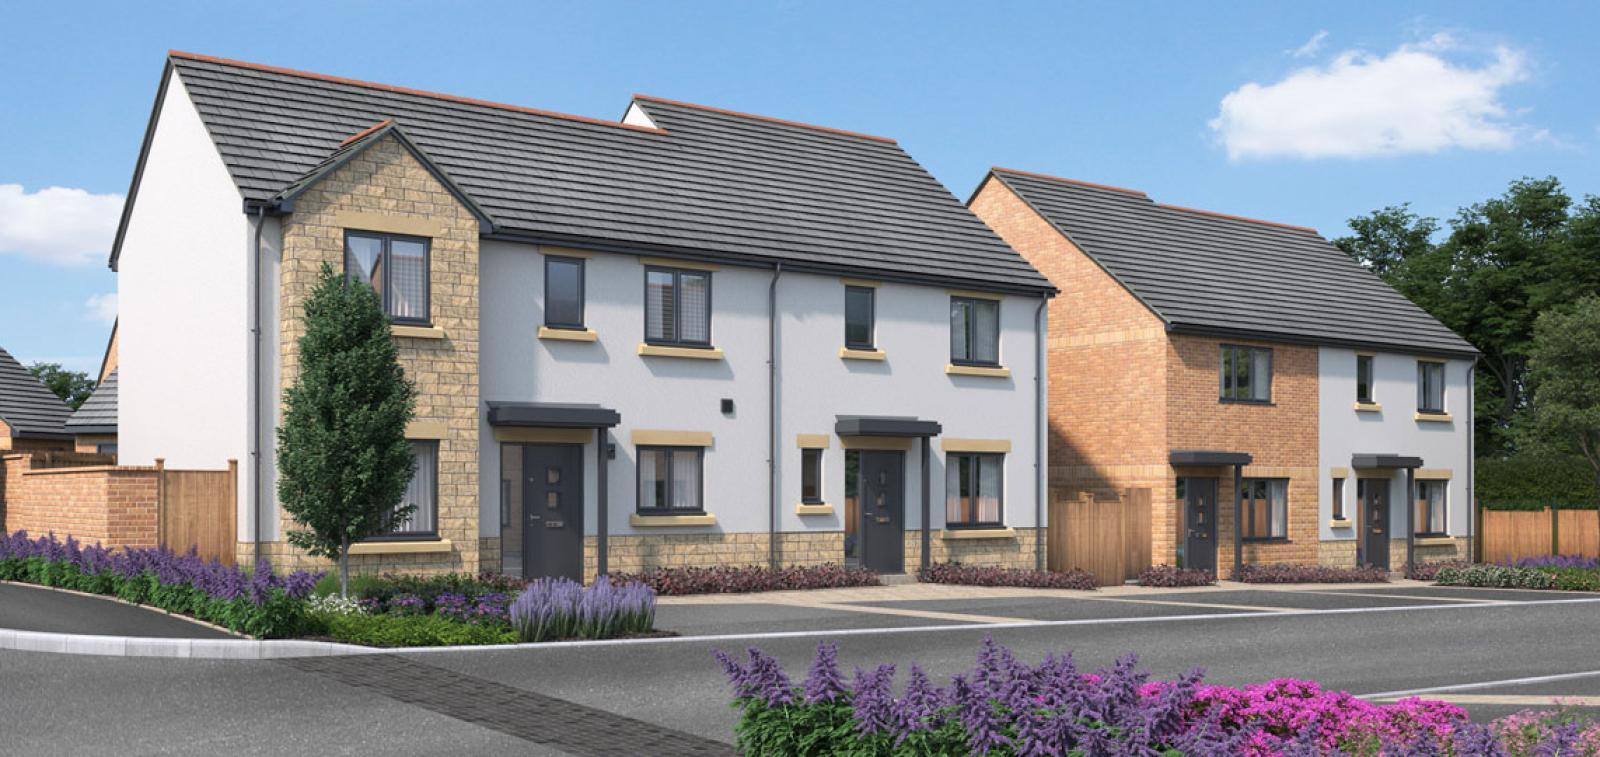 CGI of the new Kingsfield development in Glastonbury